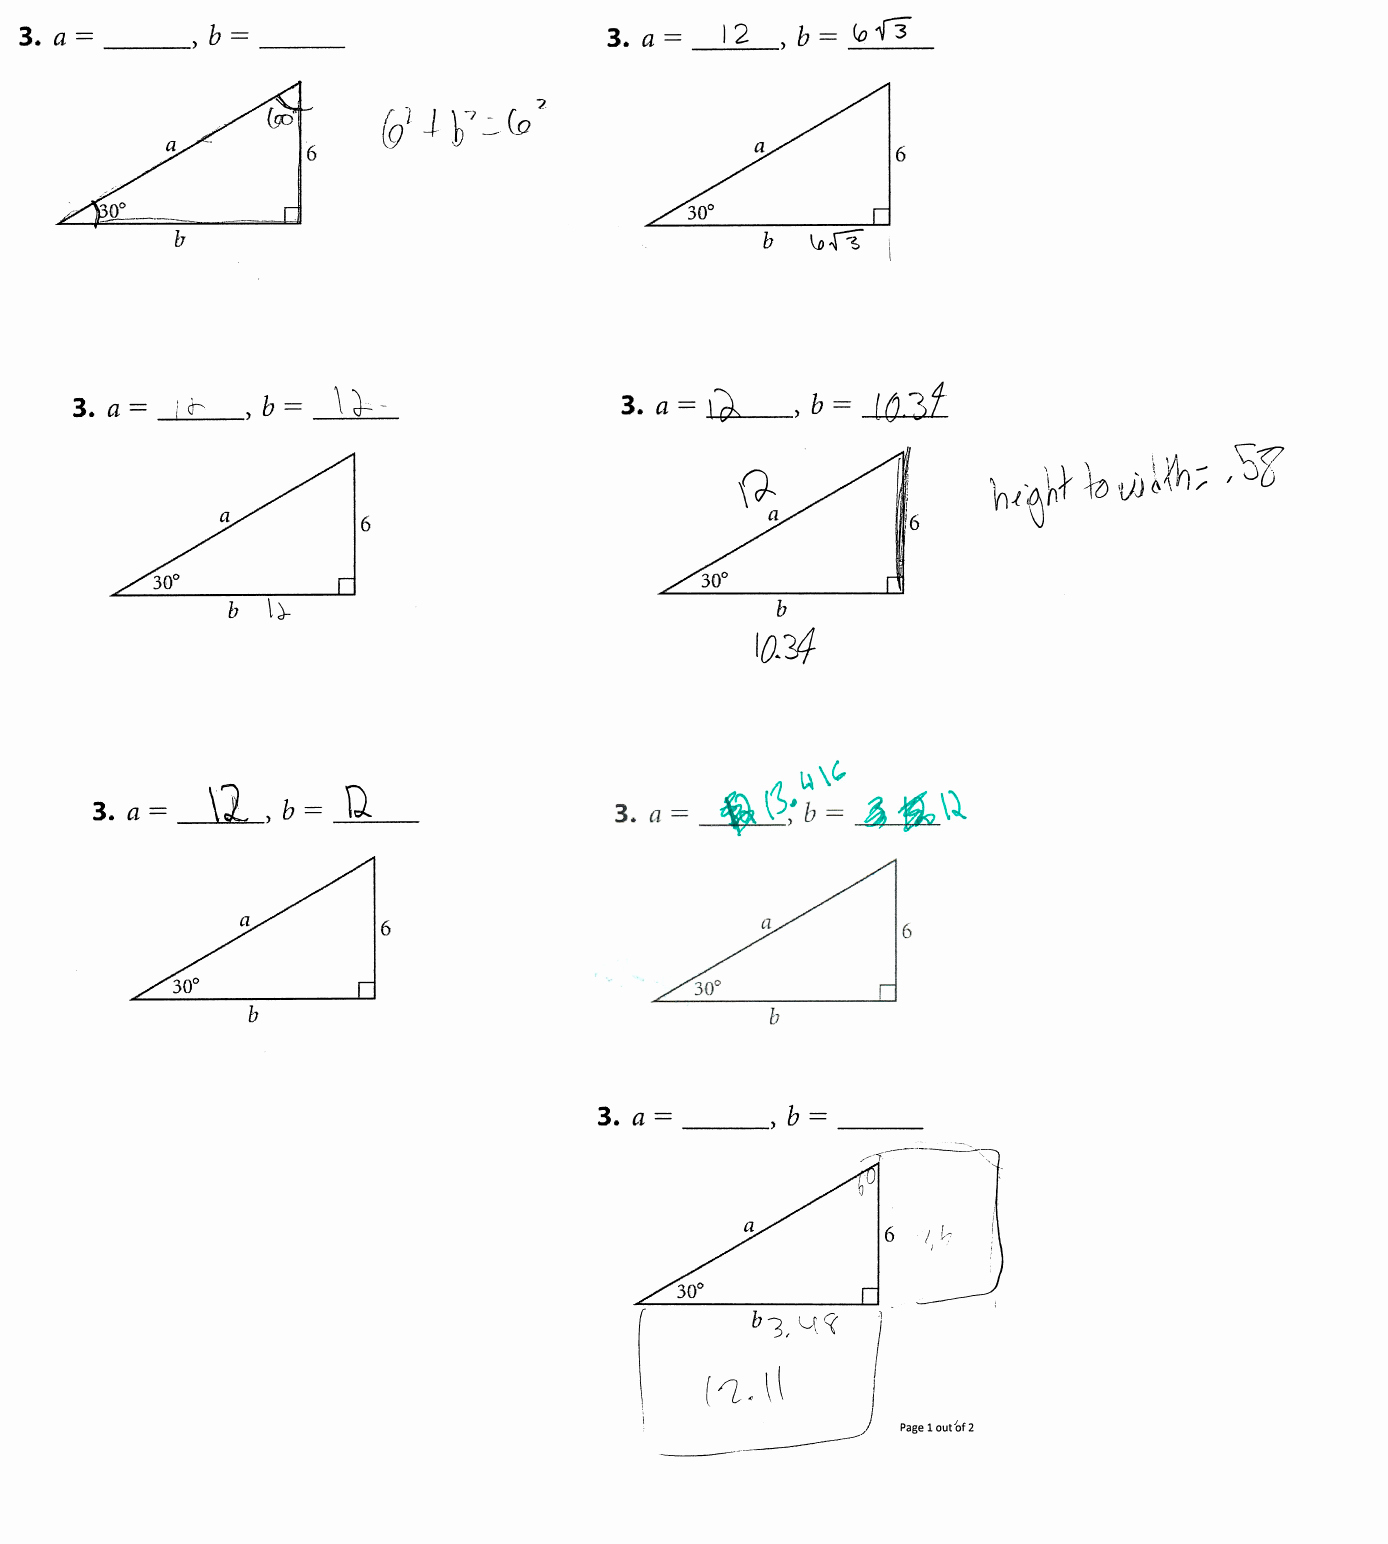 Similar Right Triangles Worksheet Beautiful Similarity Right Triangles and Trigonometry Math Mistakes